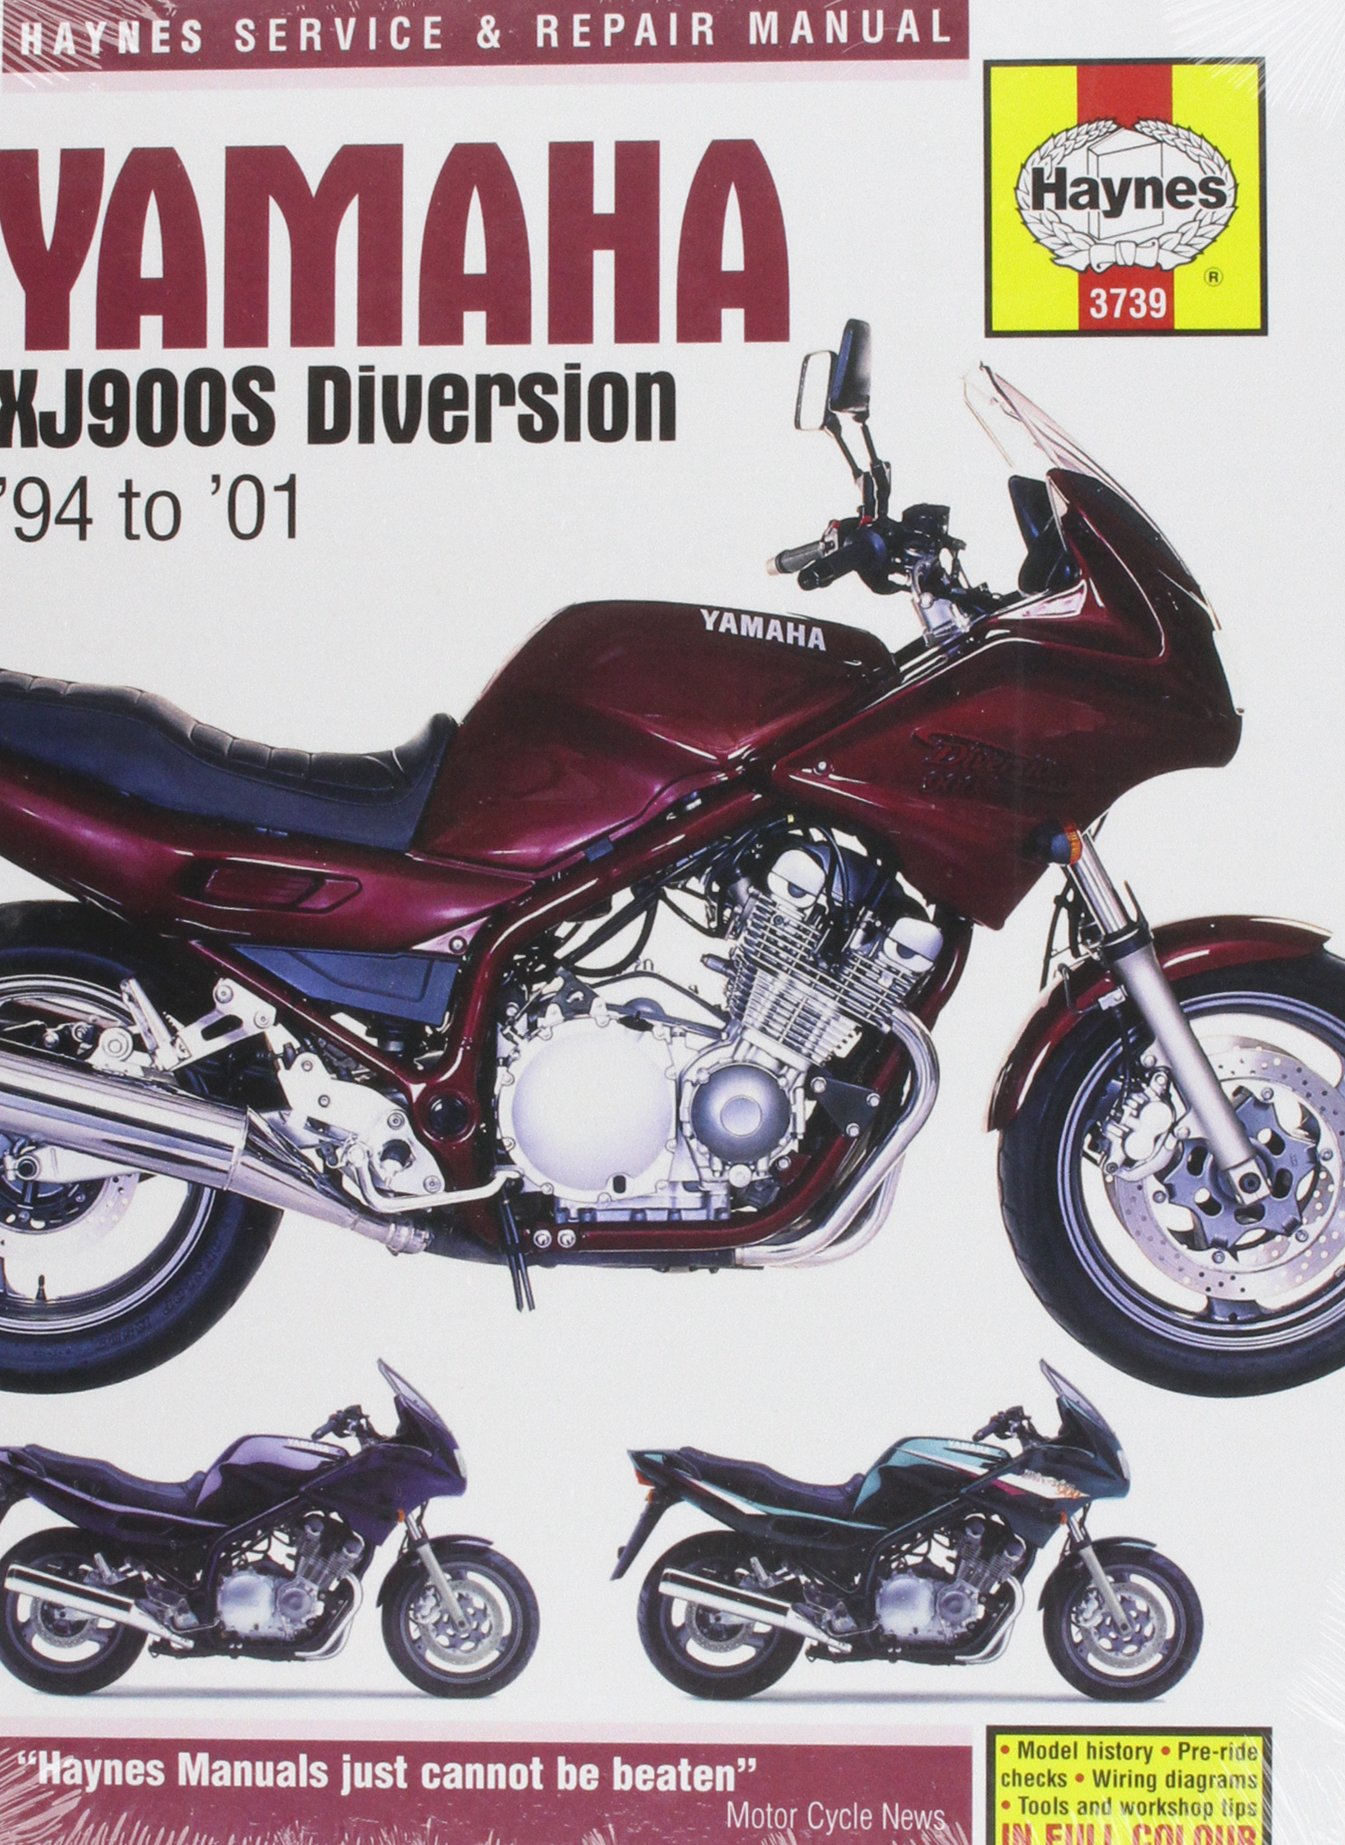 Yamaha Xj900s Diversion Service And Repair Manual Haynes Service And Repair Manual Series Coombs Matthew 9781859609057 Amazon Com Books